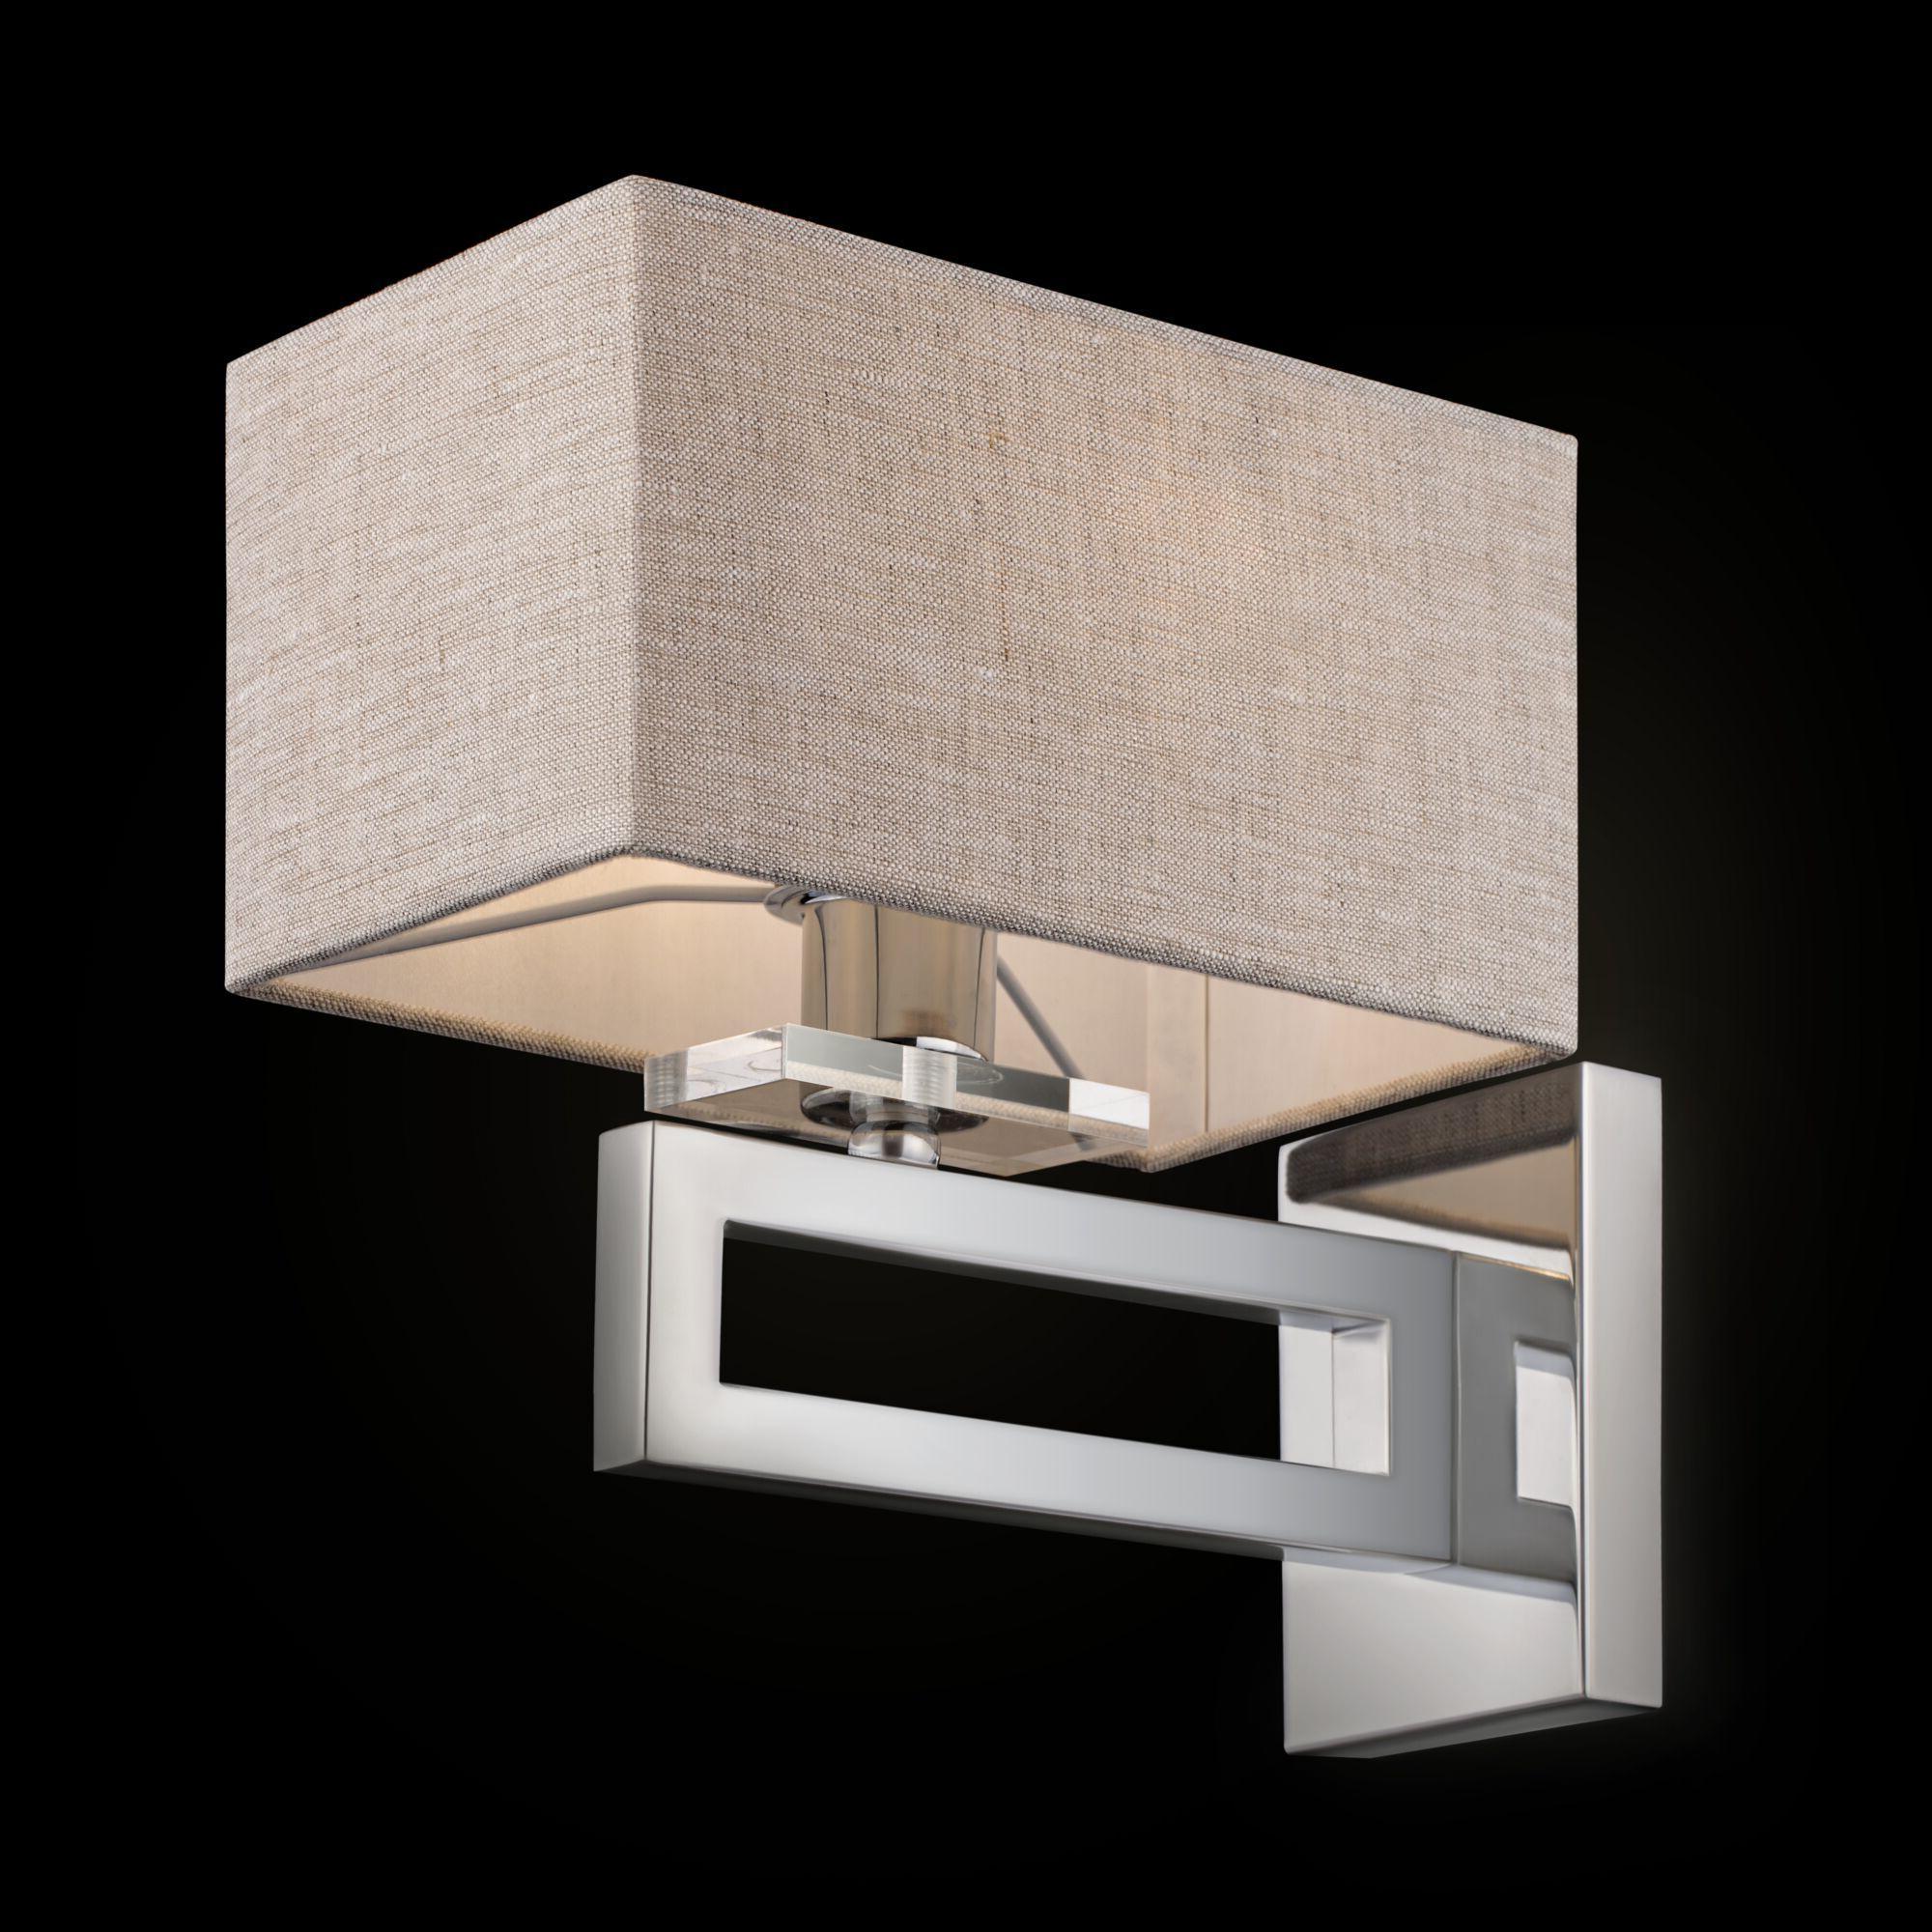 Бра Maytoni Neoclassic Megapolis MOD906-01-N, 1xE14x40W, хром, серый, металл, текстиль - фото 2